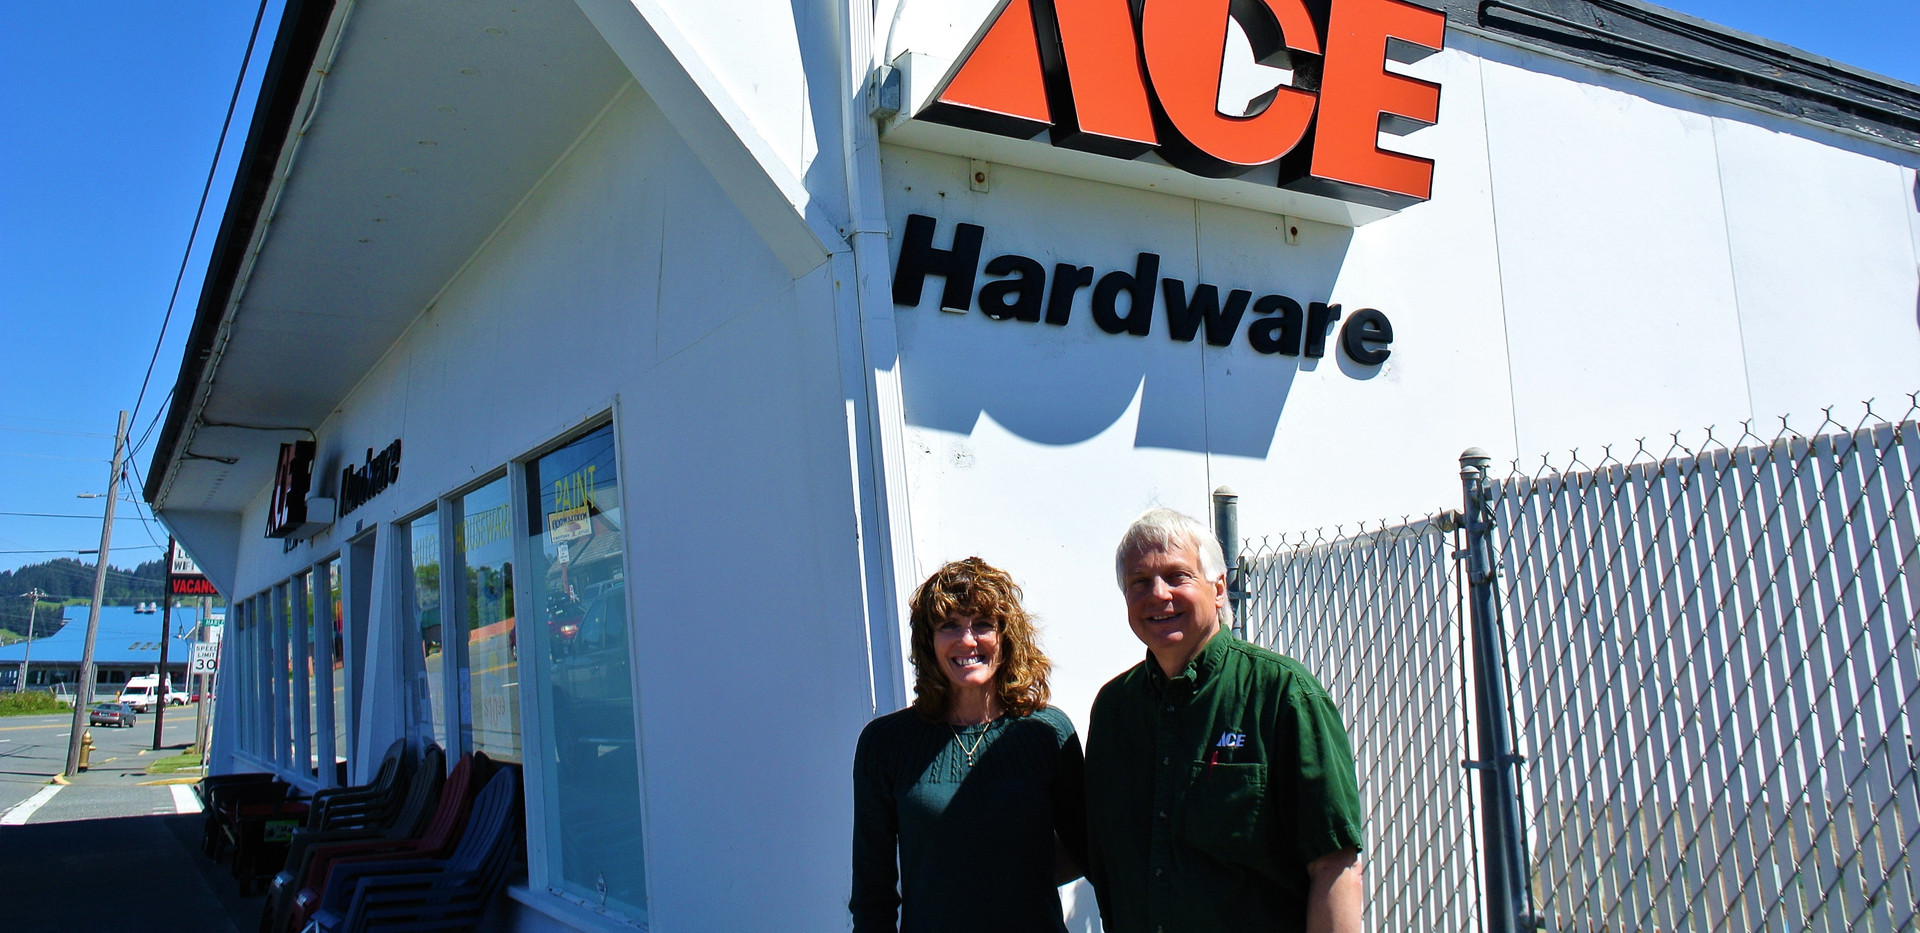 Dan's Ace Hardware